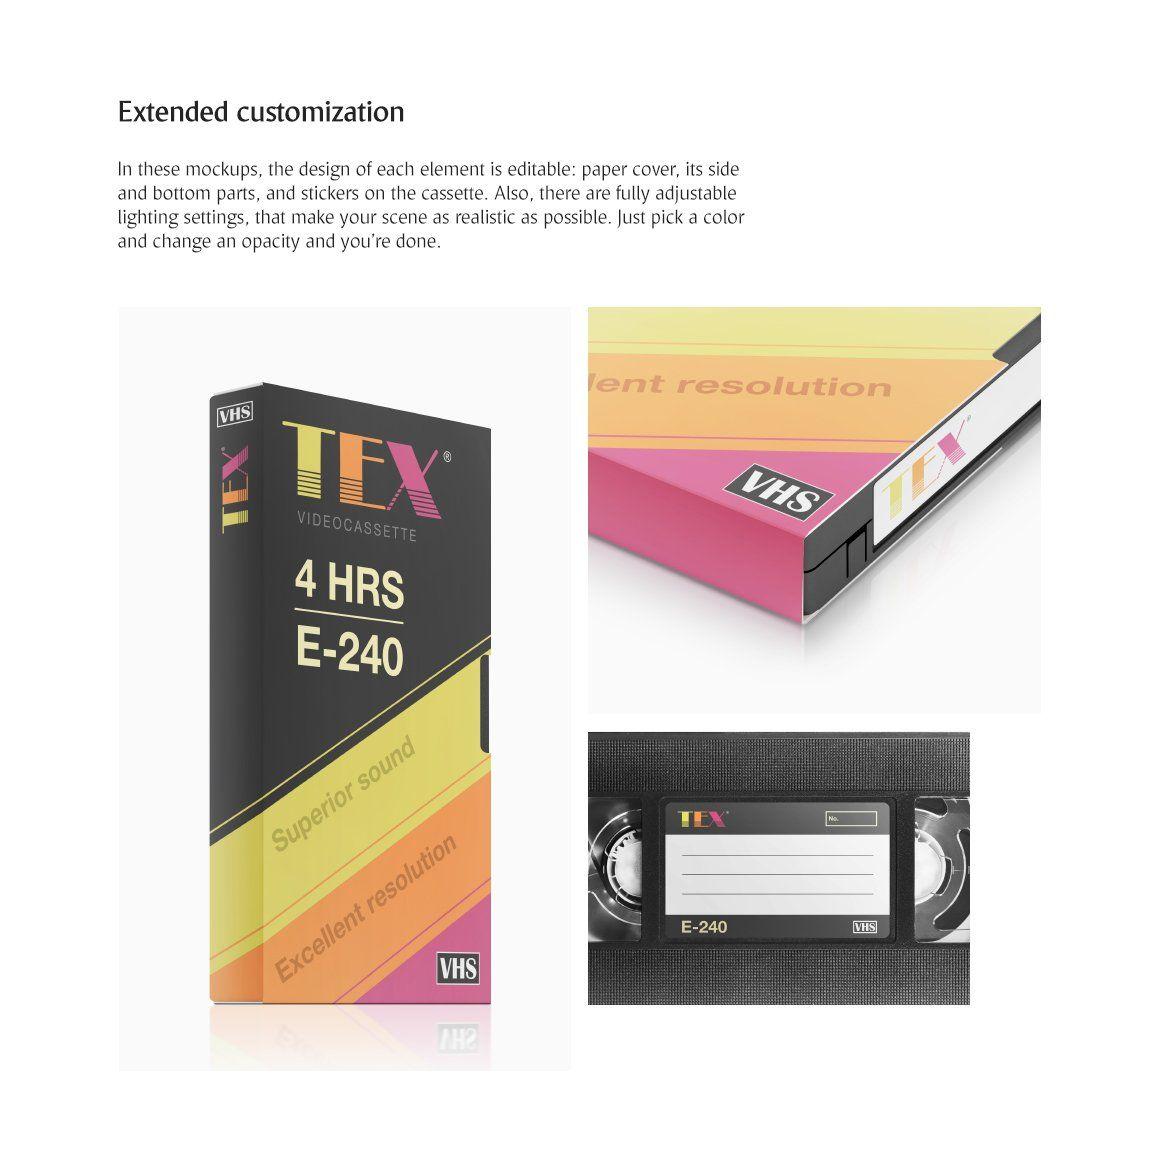 Vhs Cassette Mockups Set Vhs Cassette Packaging Mockup Cassette